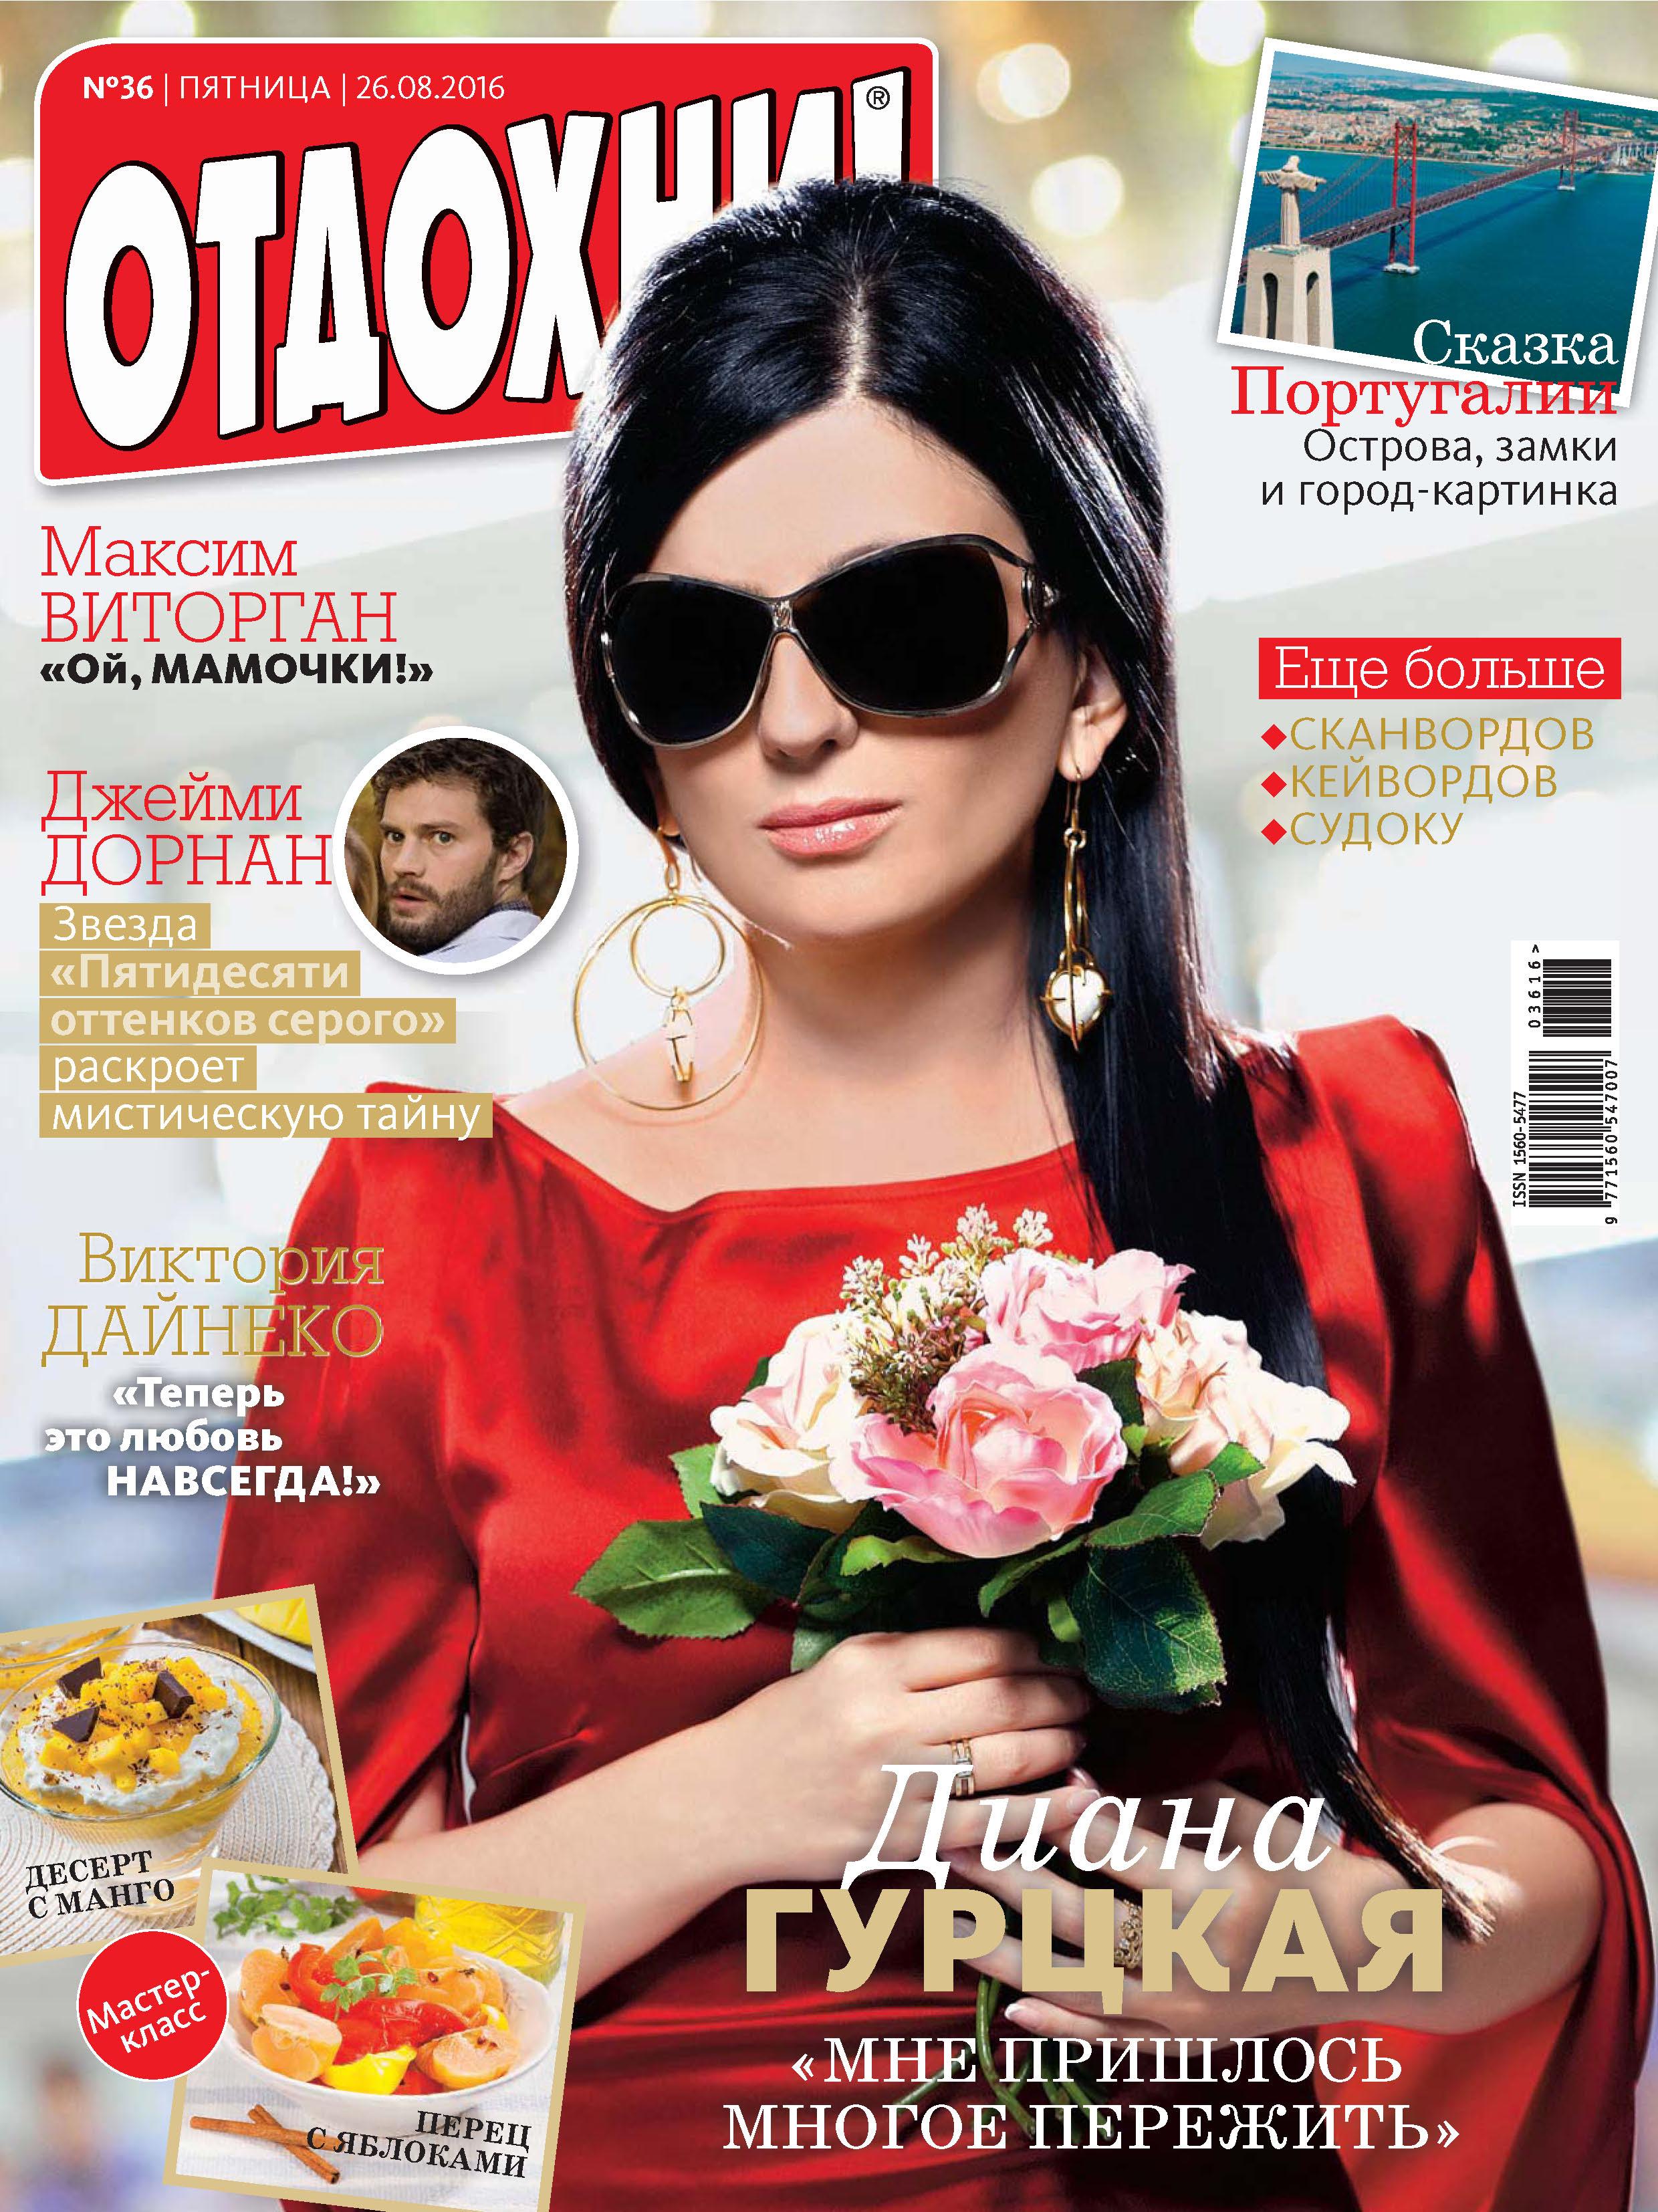 ИД «Бурда» Журнал «Отдохни!» №36/2016 ид бурда журнал отдохни 07 2016